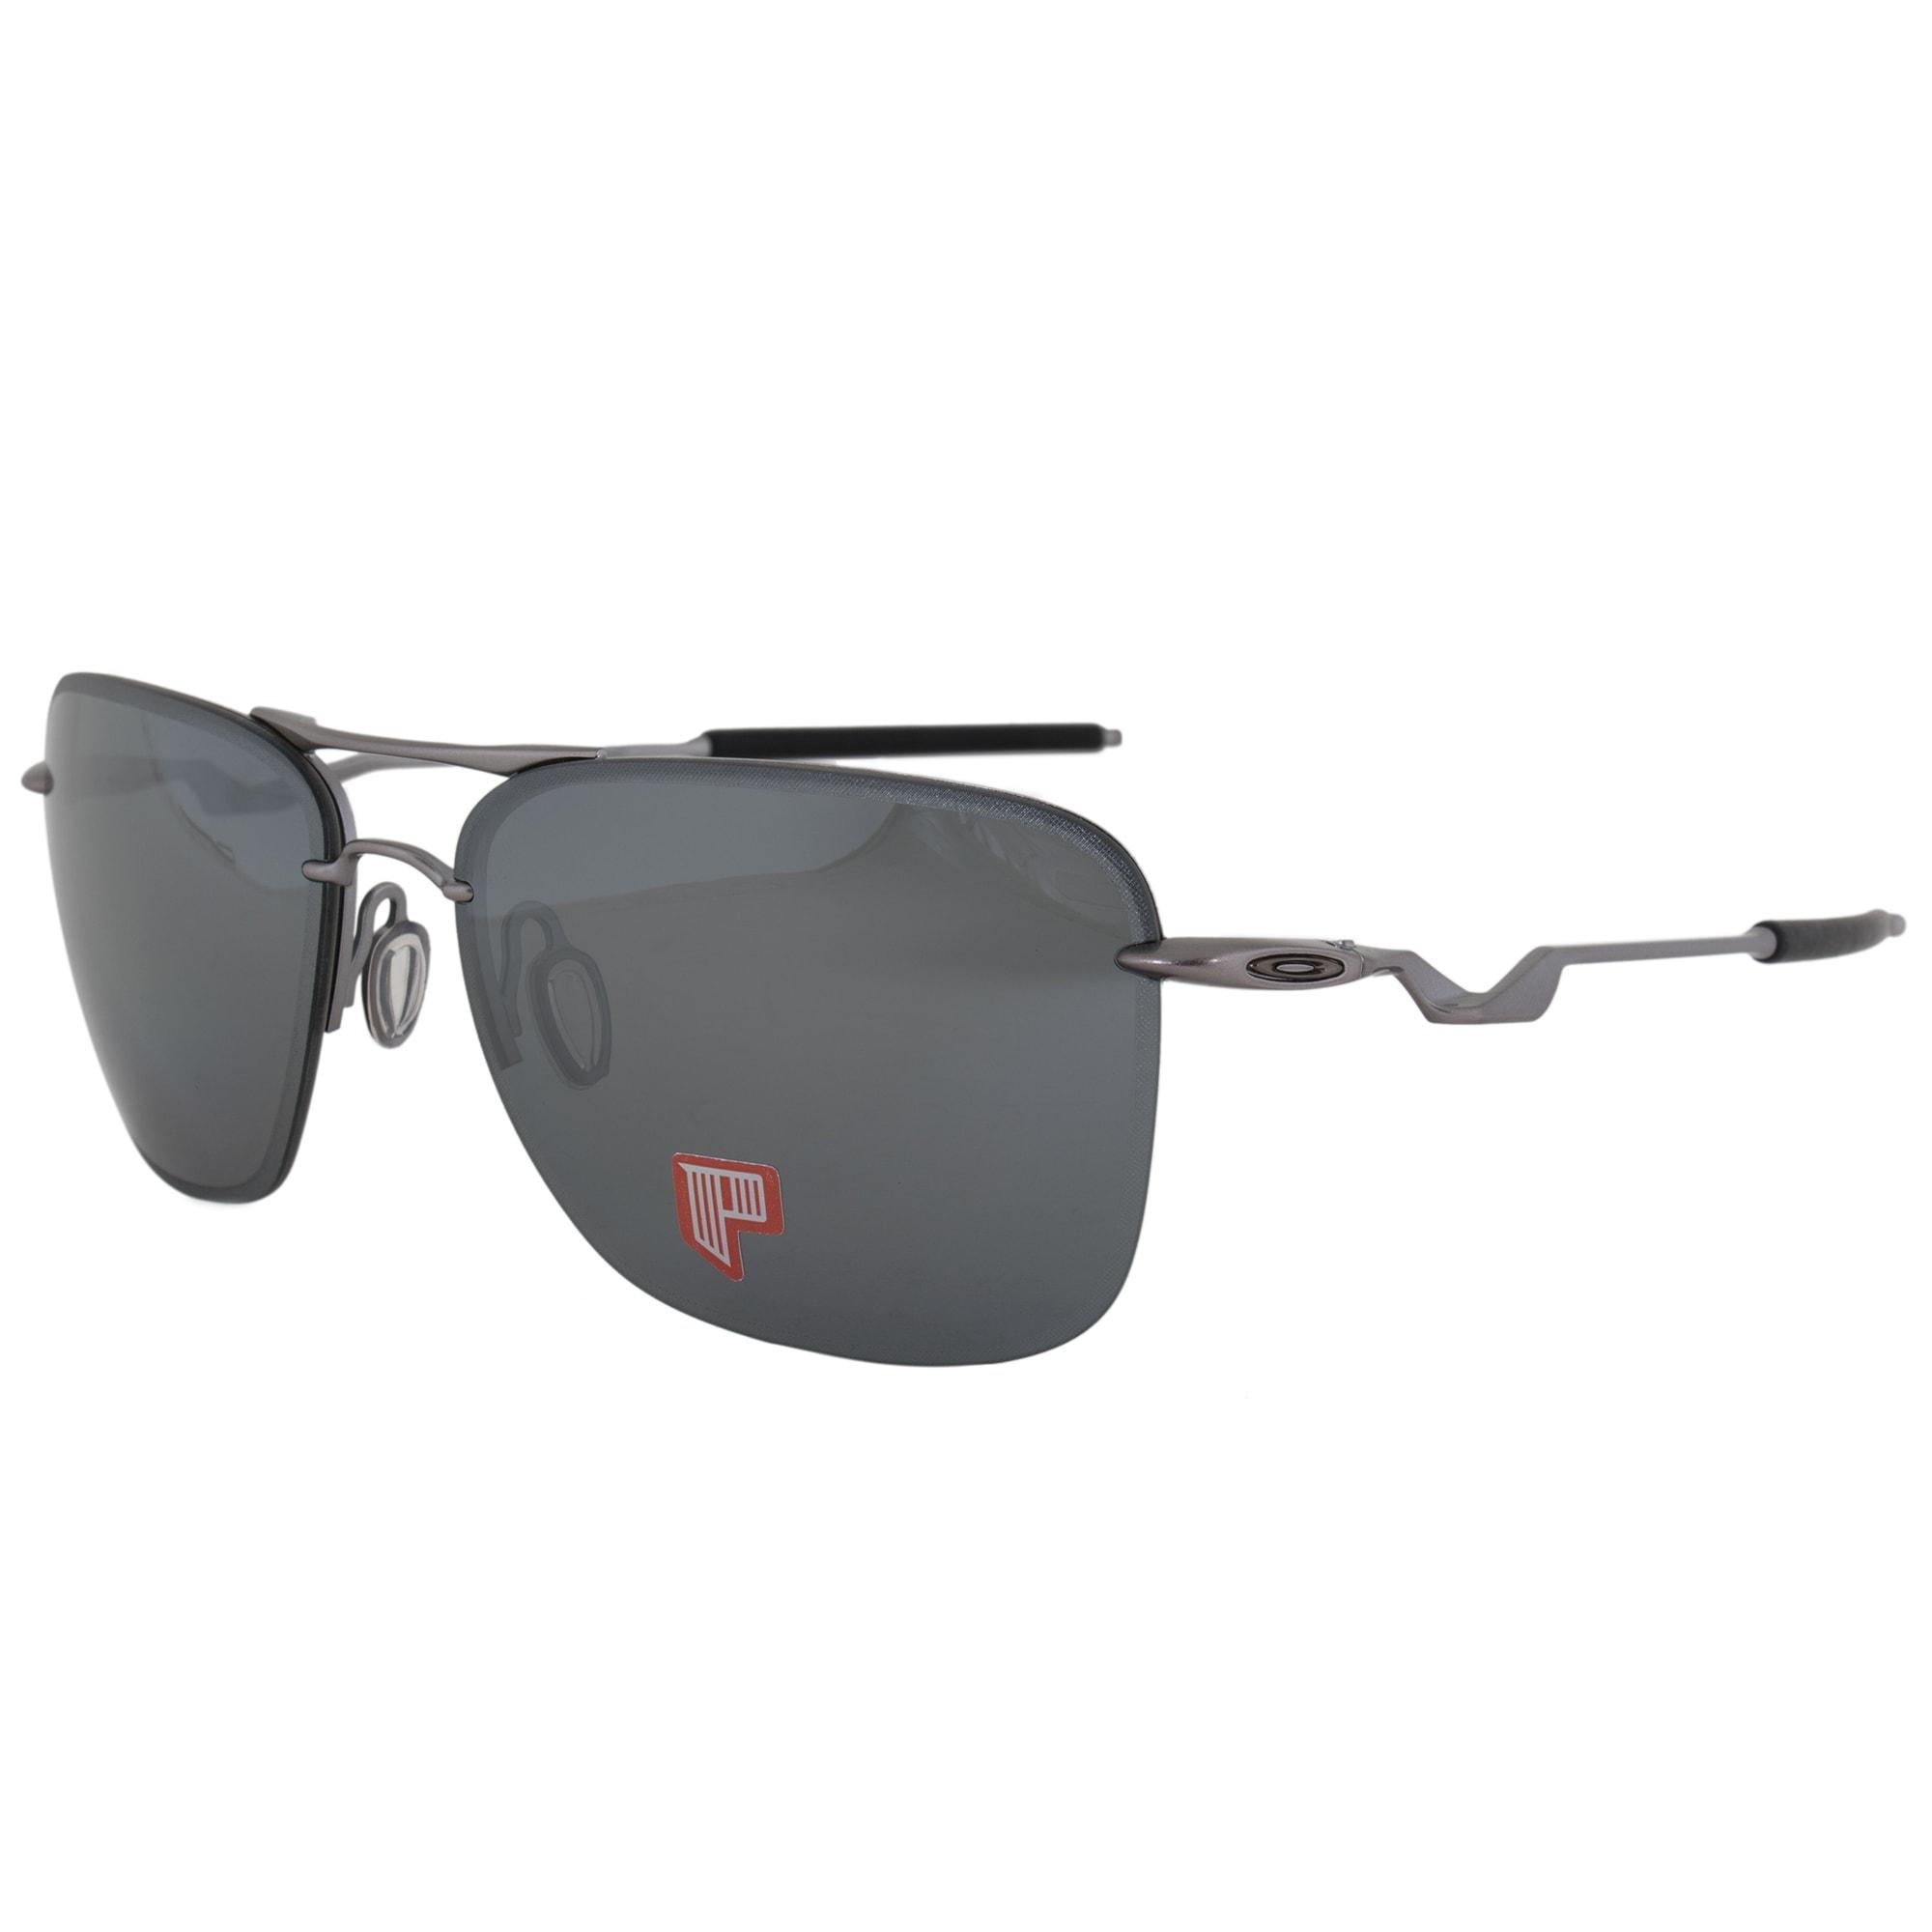 59d2c24fcd3 Shop Oakley Tailhook Square Sunglasses 0OO4087 408706 60 POL - Free ...